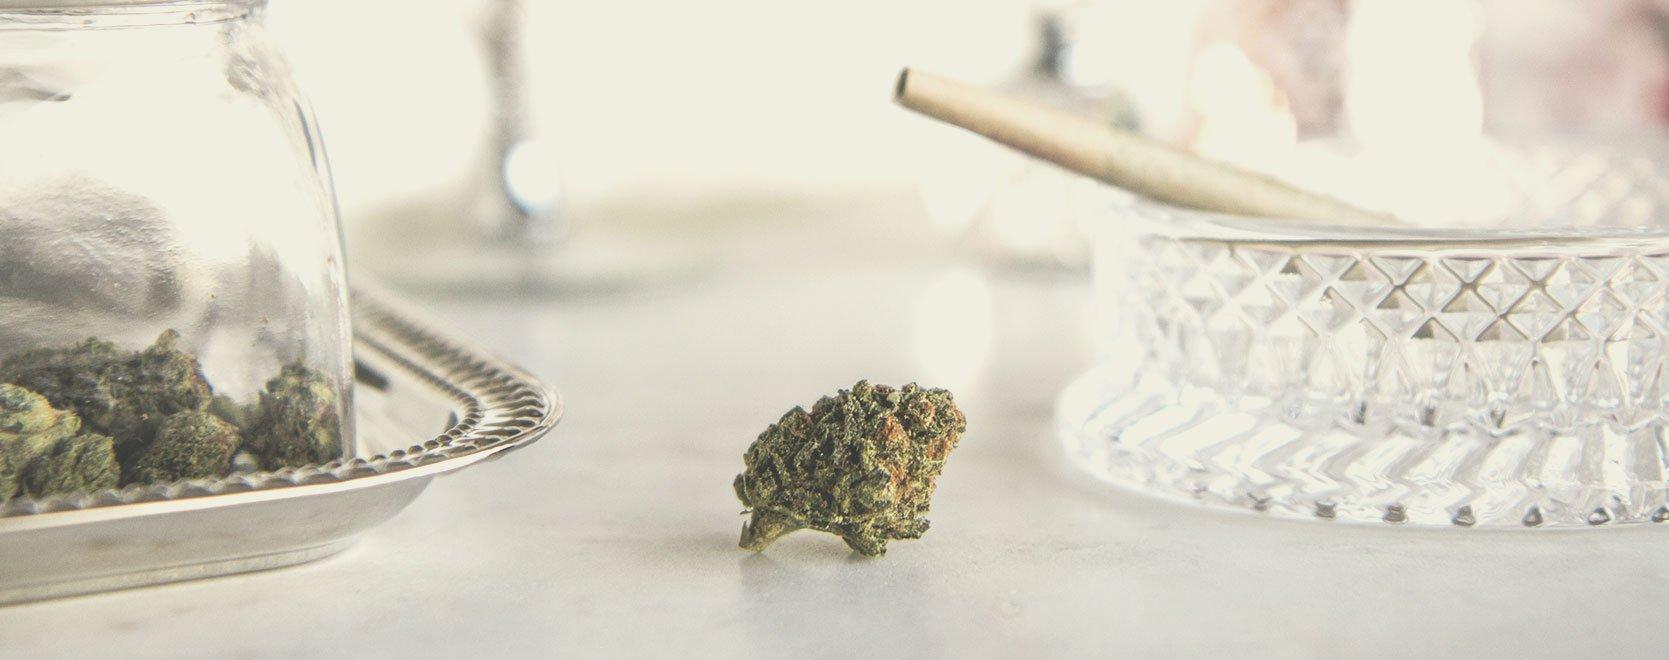 Sådan bruger du cannabis ansvarligt